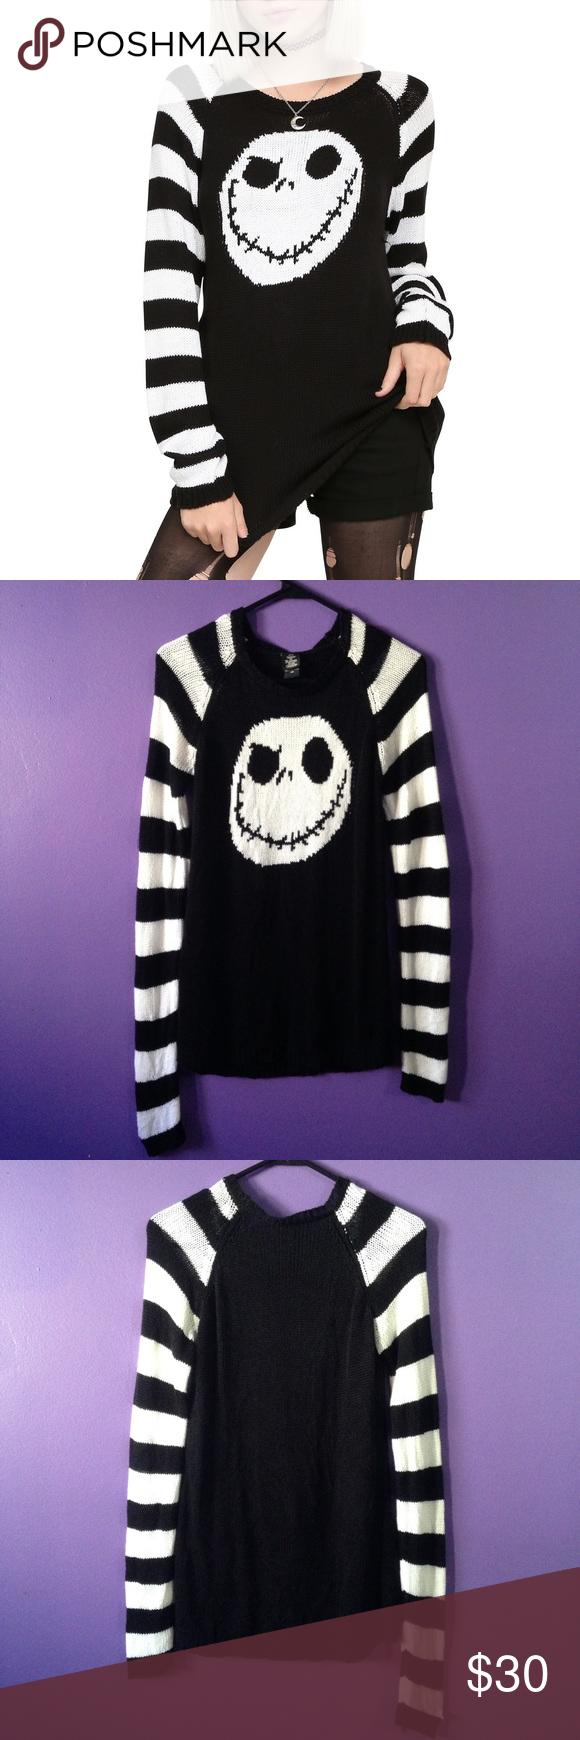 Jack Skellington Knit Sweater | Jack Skellinton | Pinterest | Hot ...